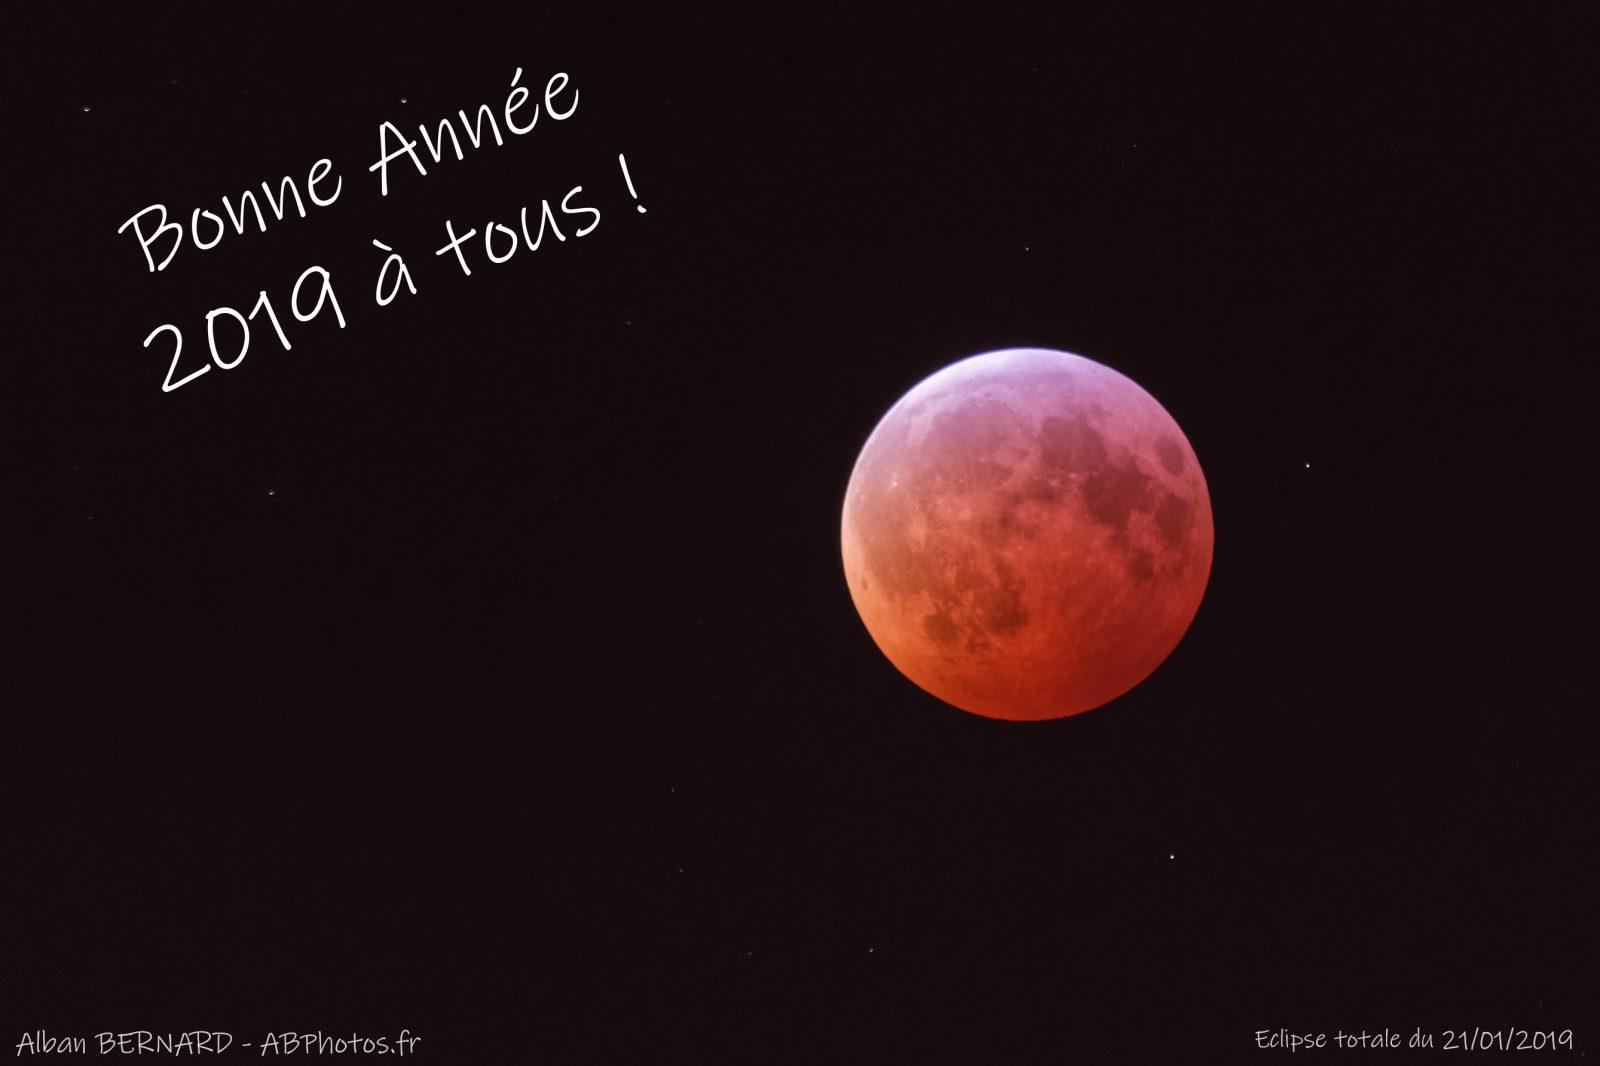 Eclipse totale de lune le 21/01/2019 - Alban BERNARD